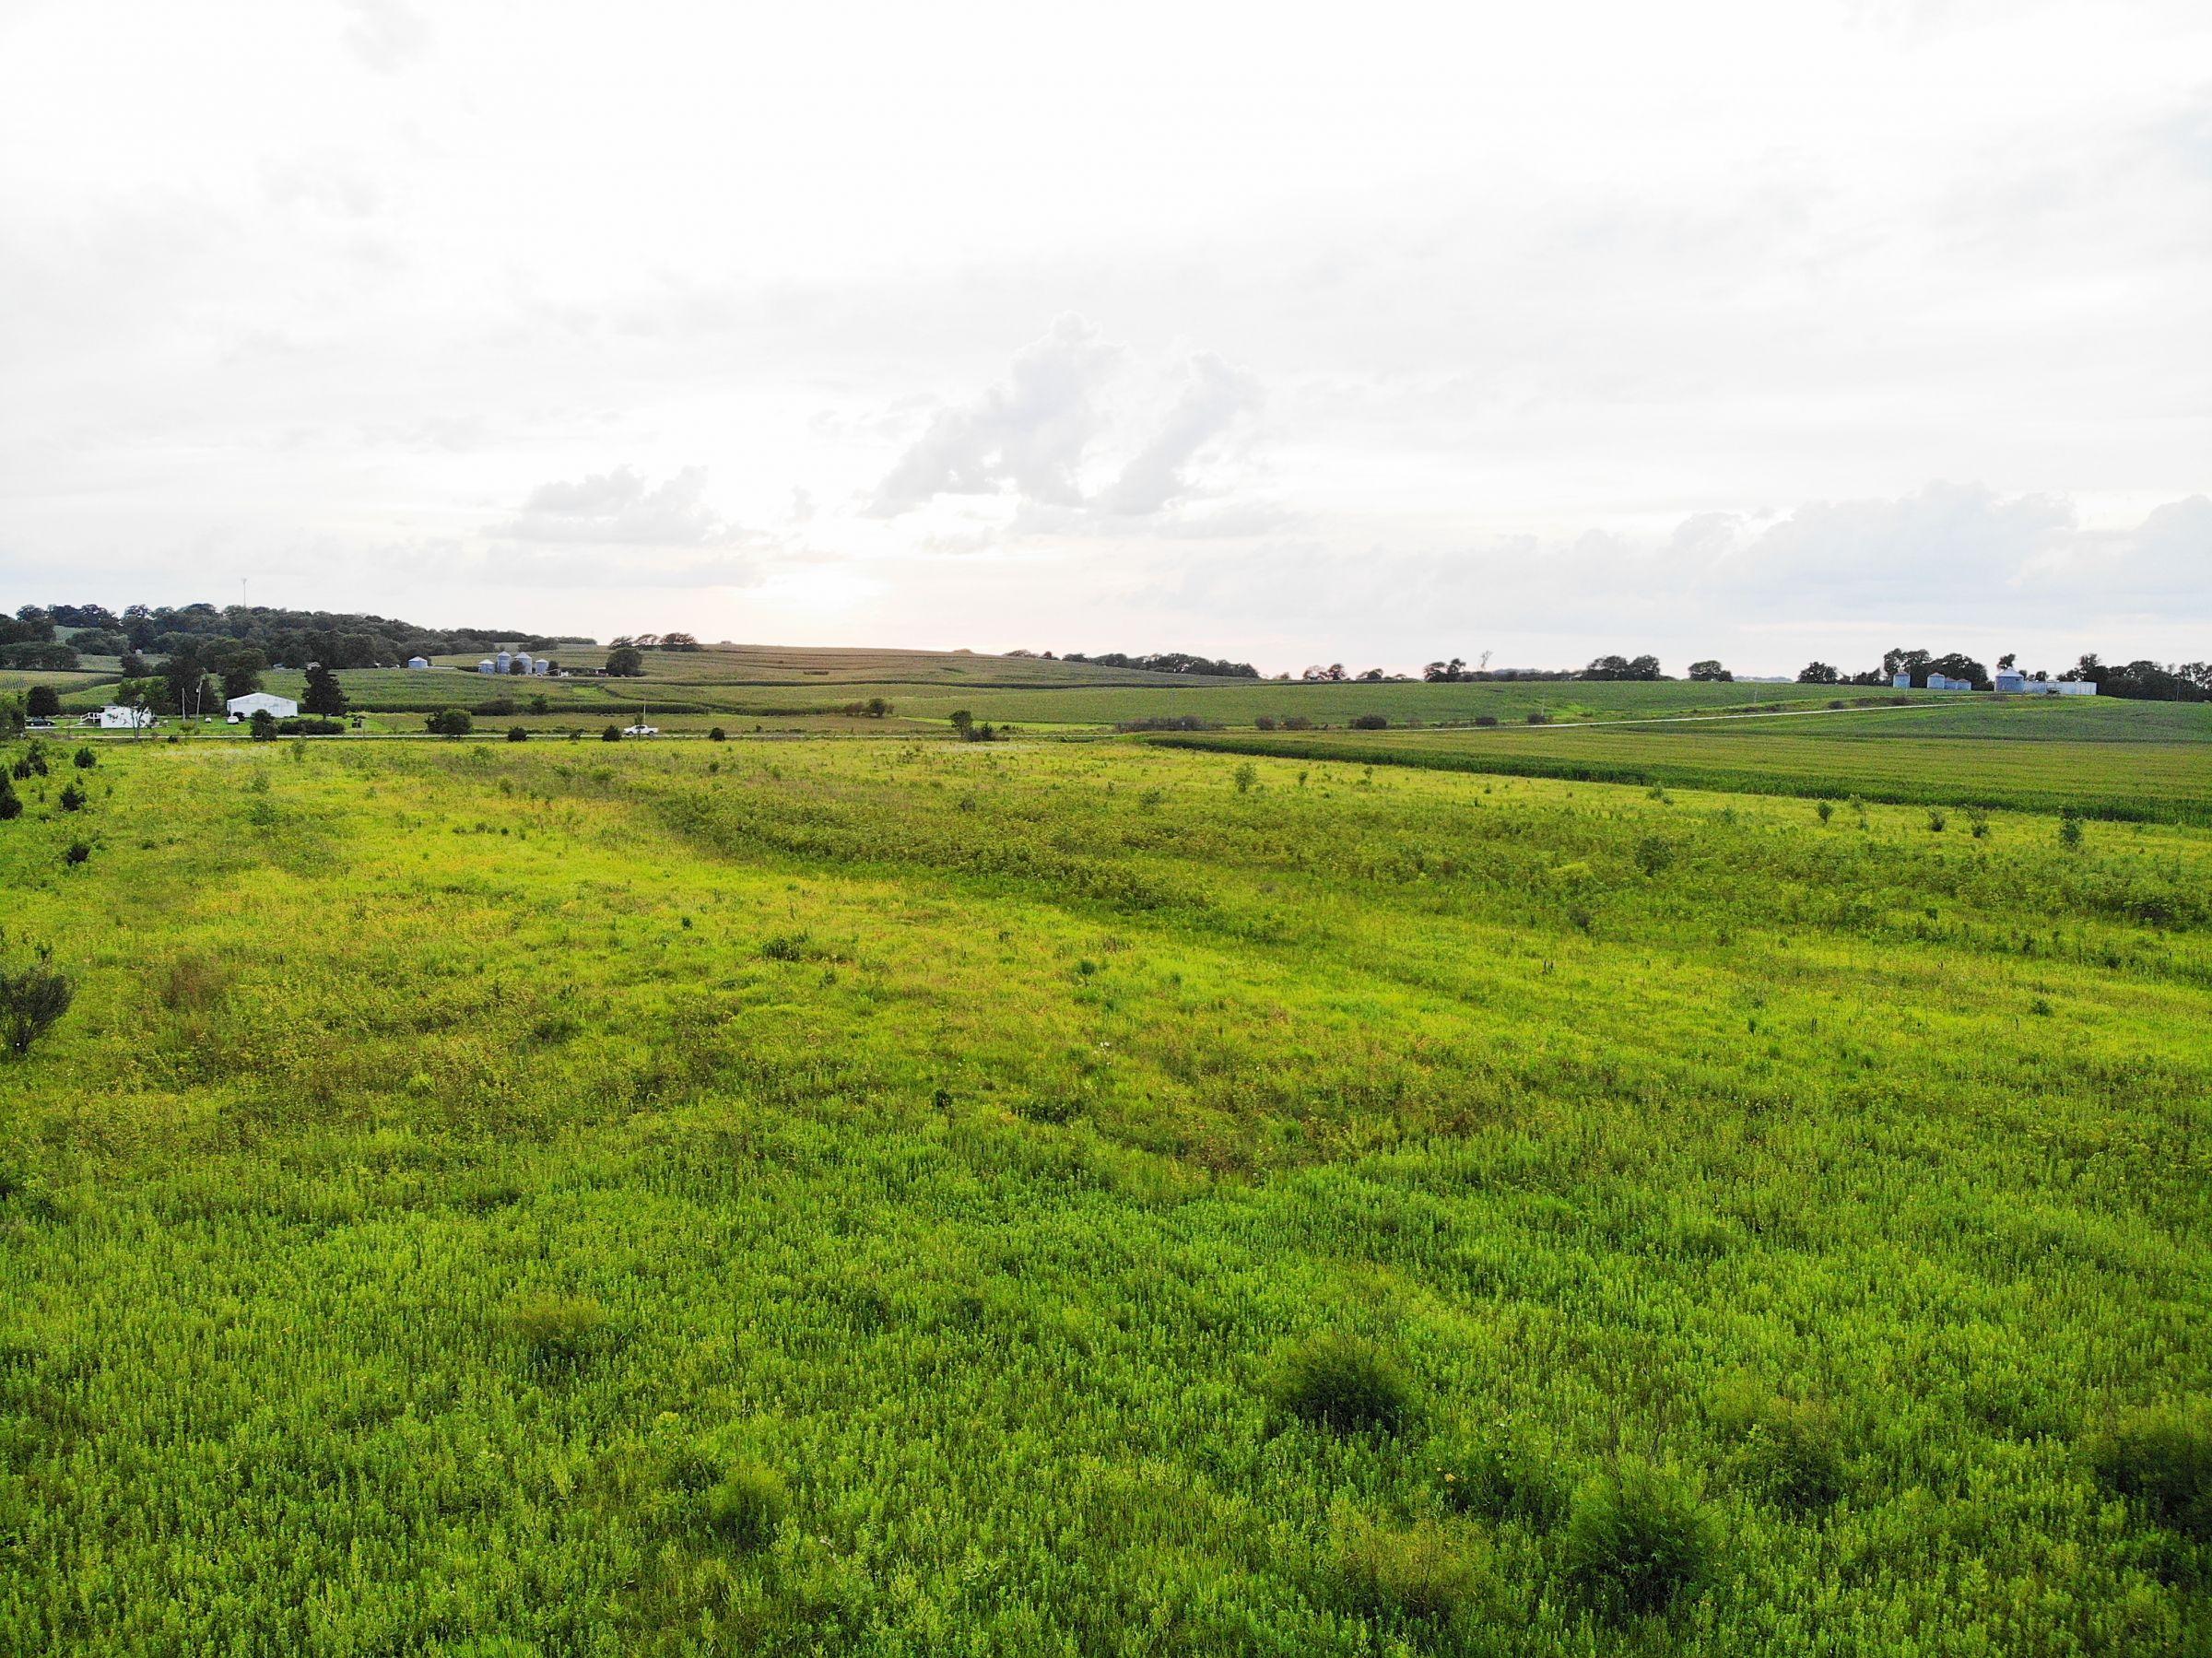 land-warren-county-iowa-38-acres-listing-number-15098-3-2020-08-01-153751.jpg